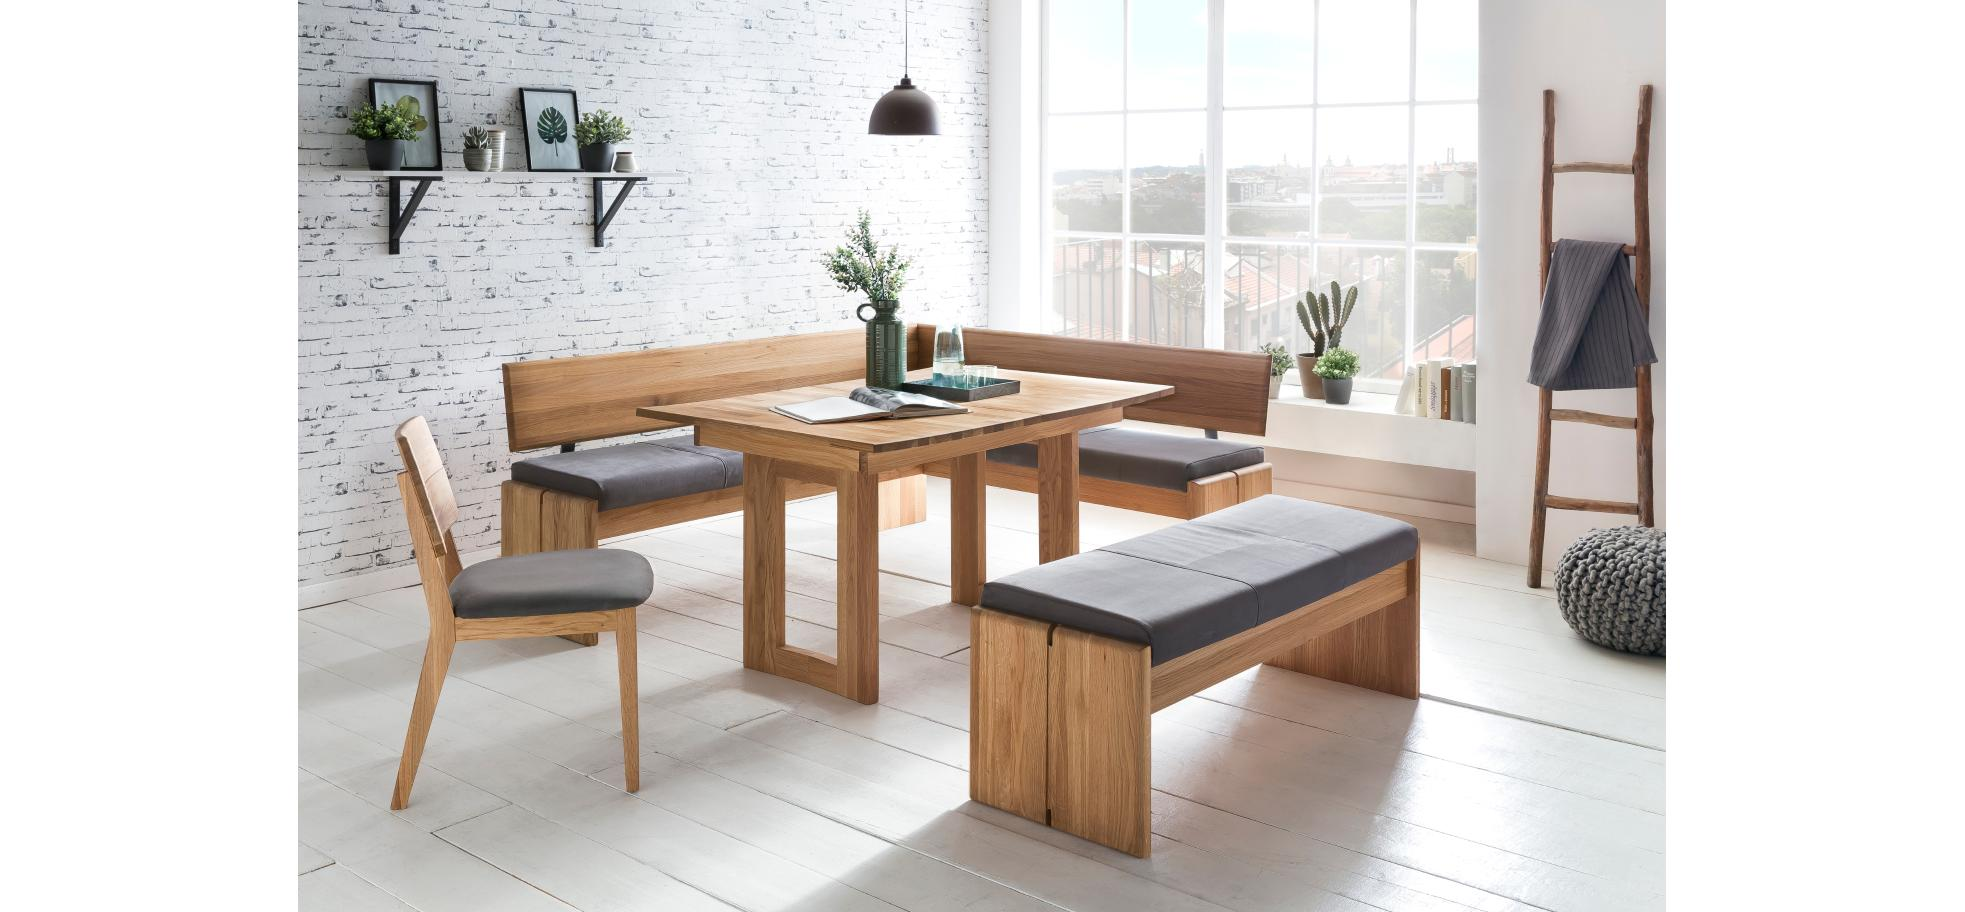 eckbank massiv mit truhe m belhaus pohl wilhelmshaven friesland m belhaus pohl gmbh. Black Bedroom Furniture Sets. Home Design Ideas